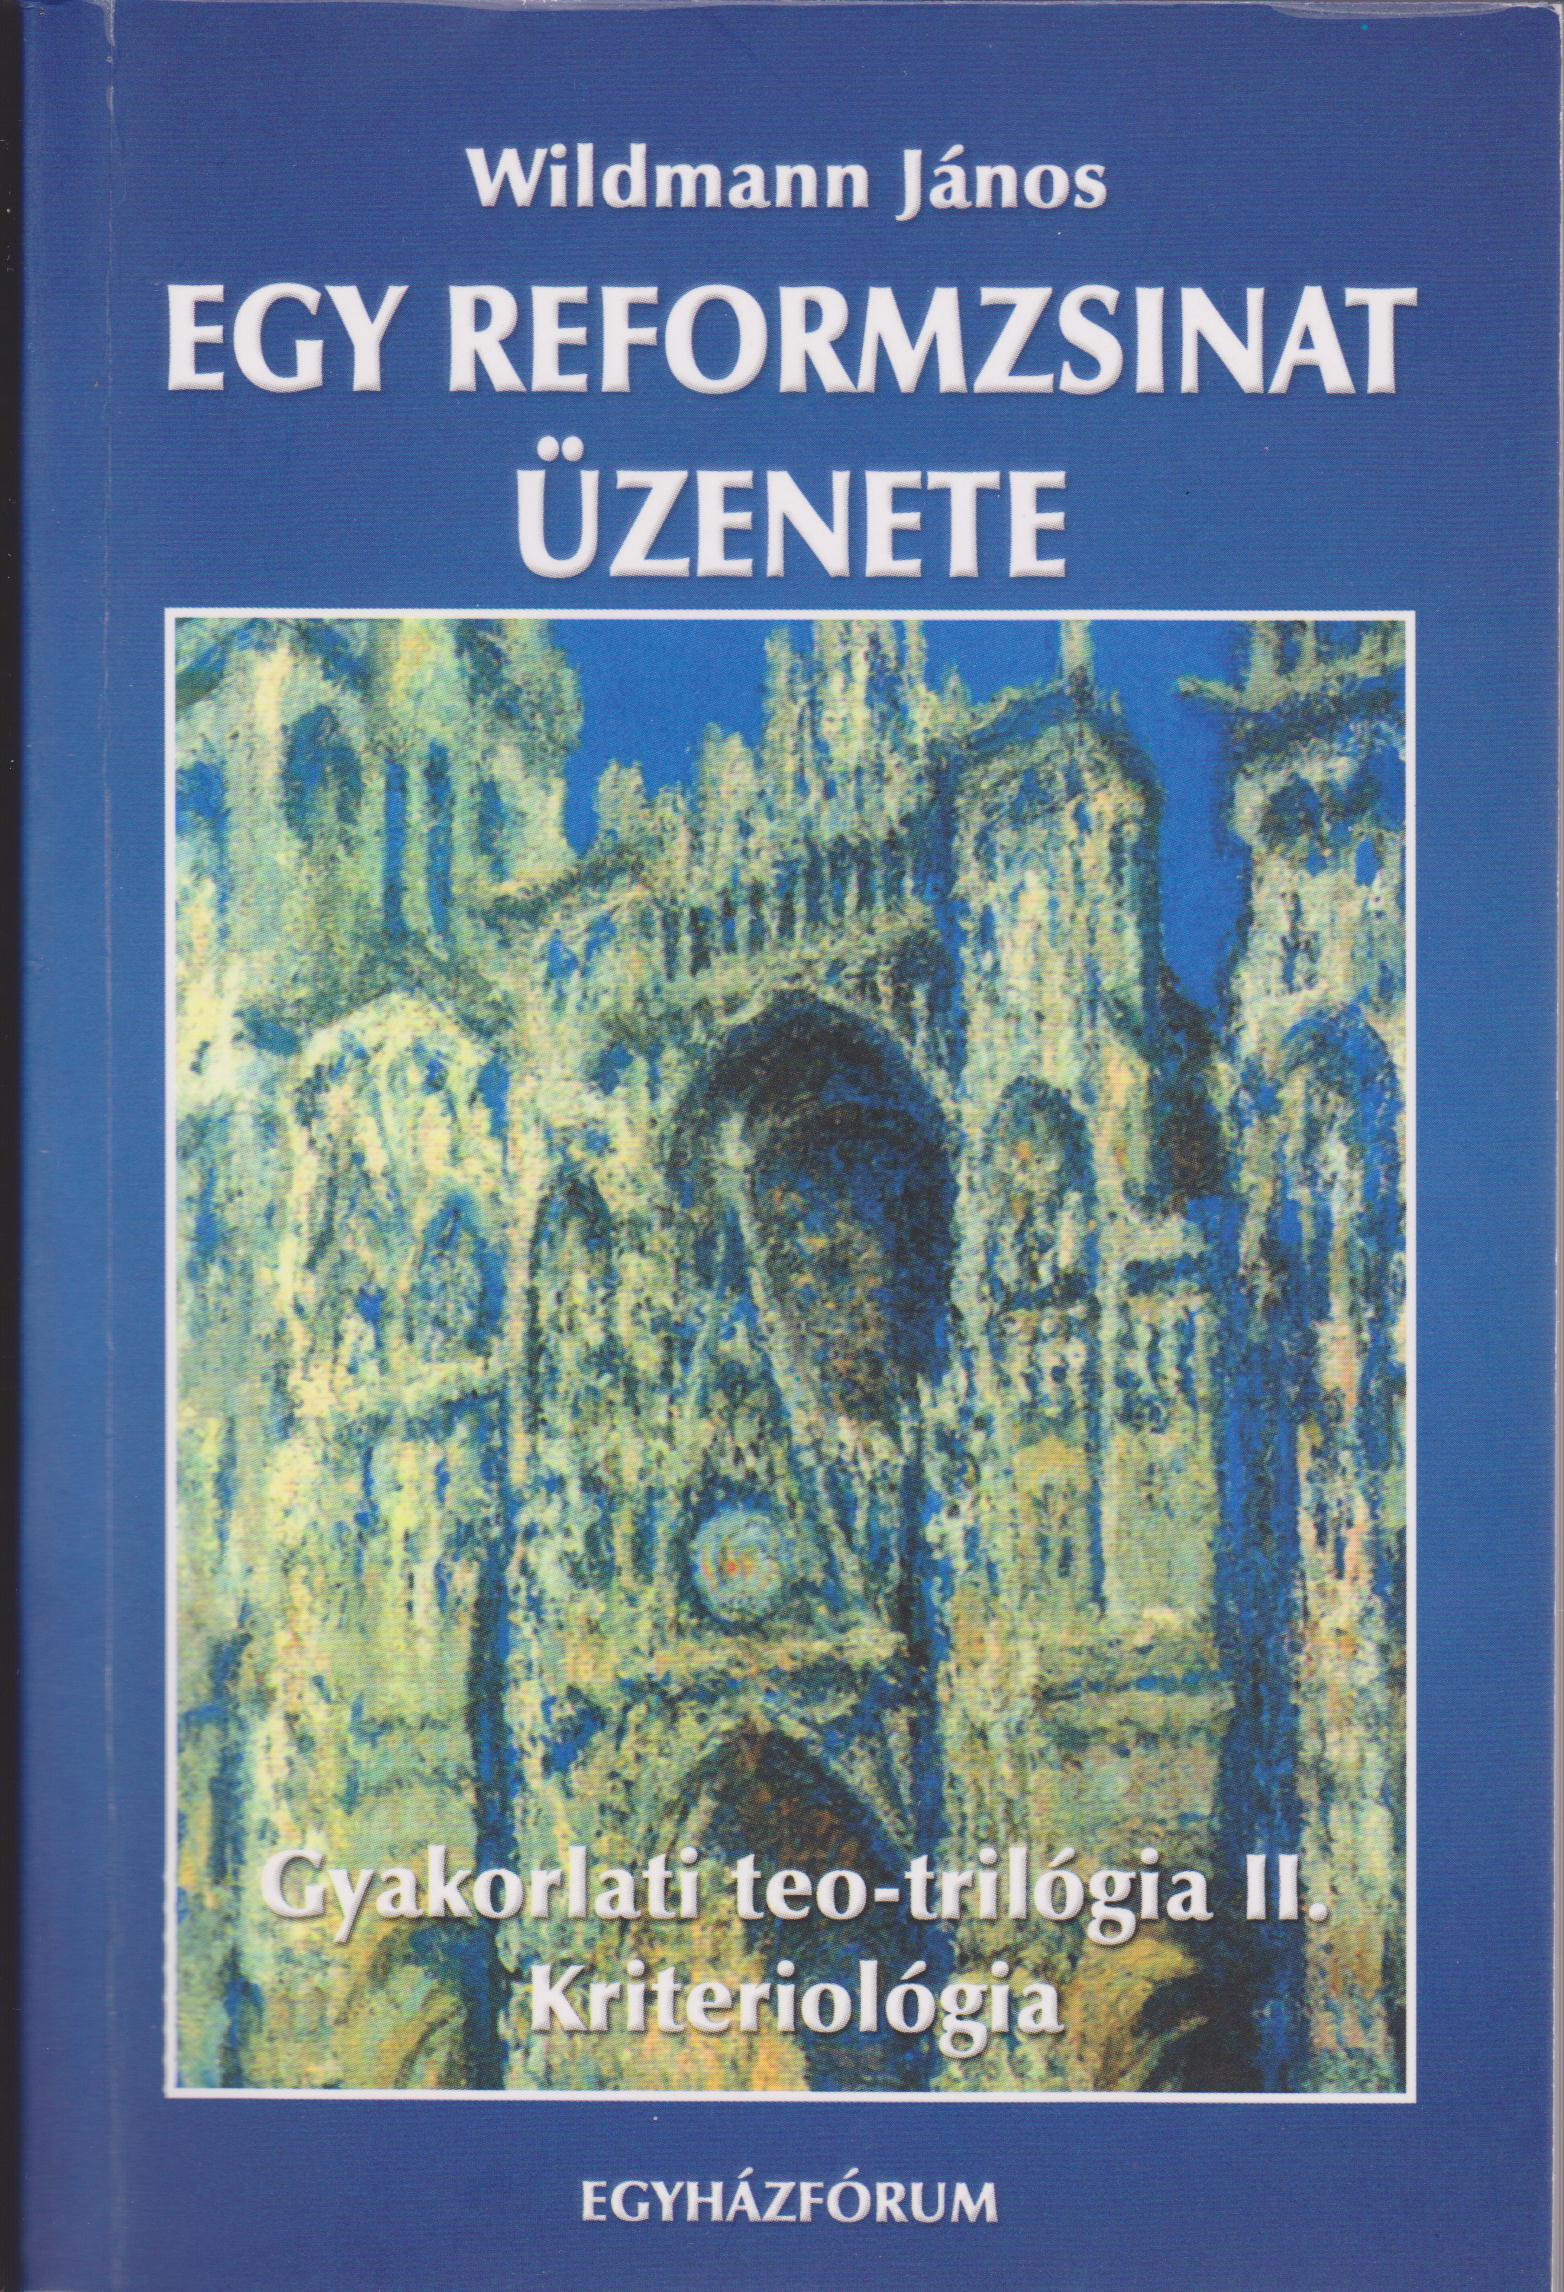 Wildmann János: Egy reformzsinat üzenete - Gyakorlati teo-trilógia II. Kriteriológia